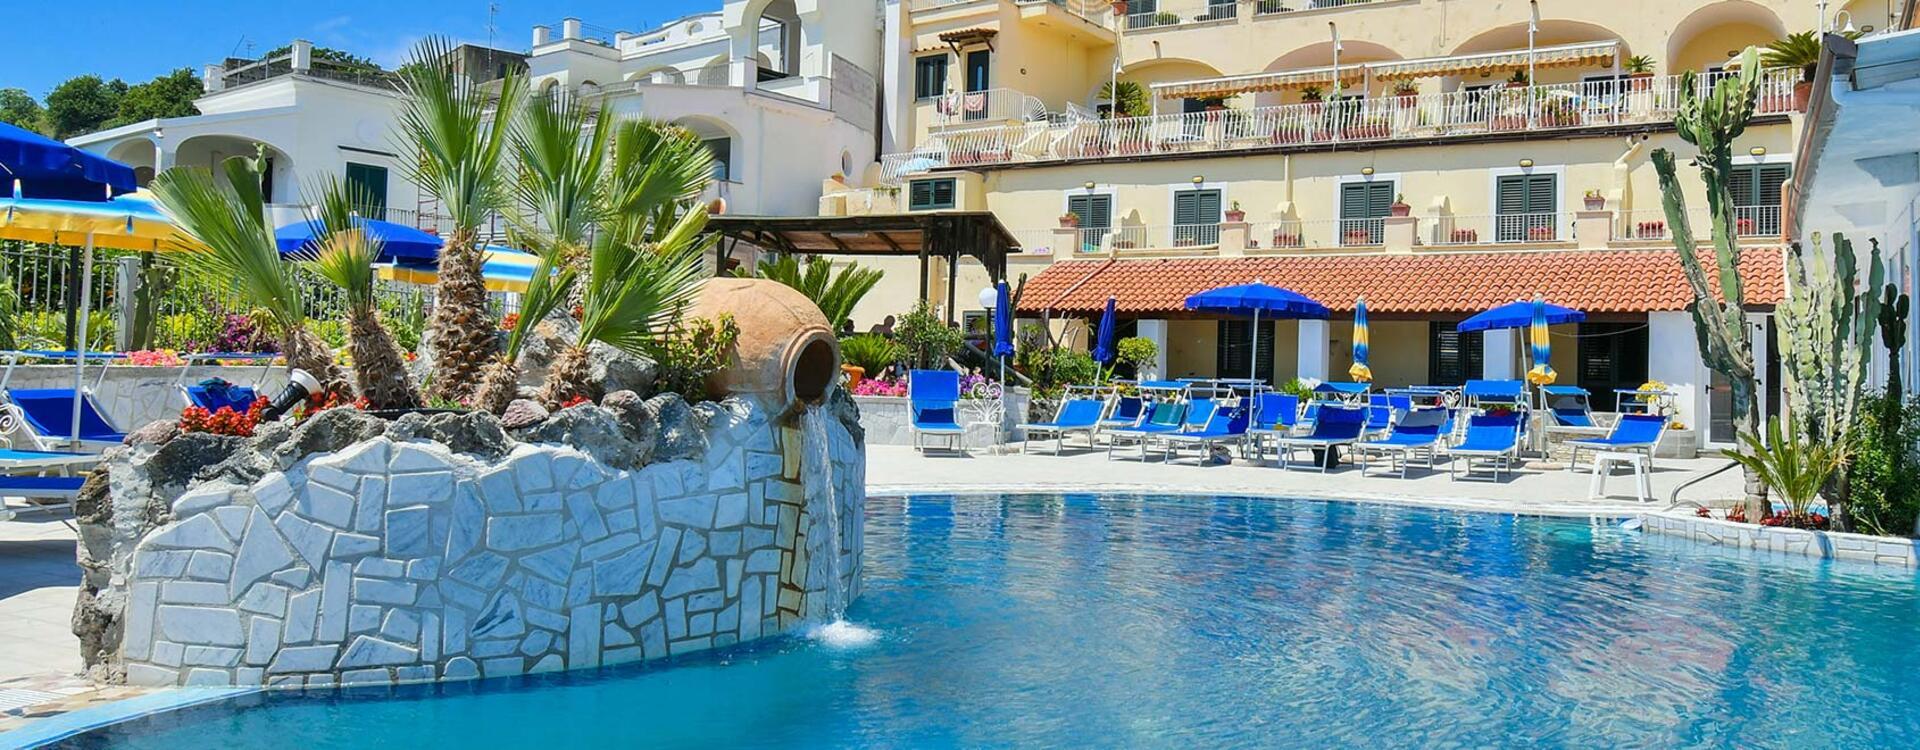 hotelsaintraphaelischia it piscine 009